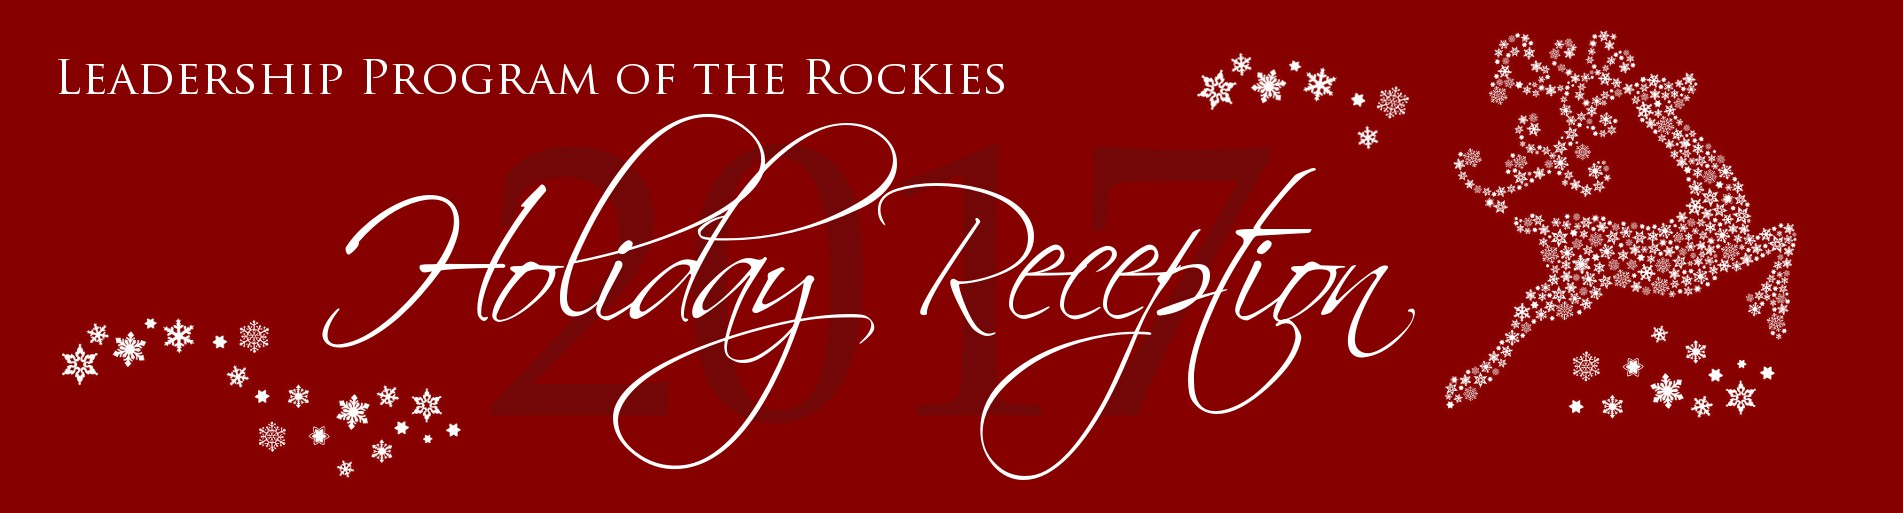 2017 Holiday Reception RSVP